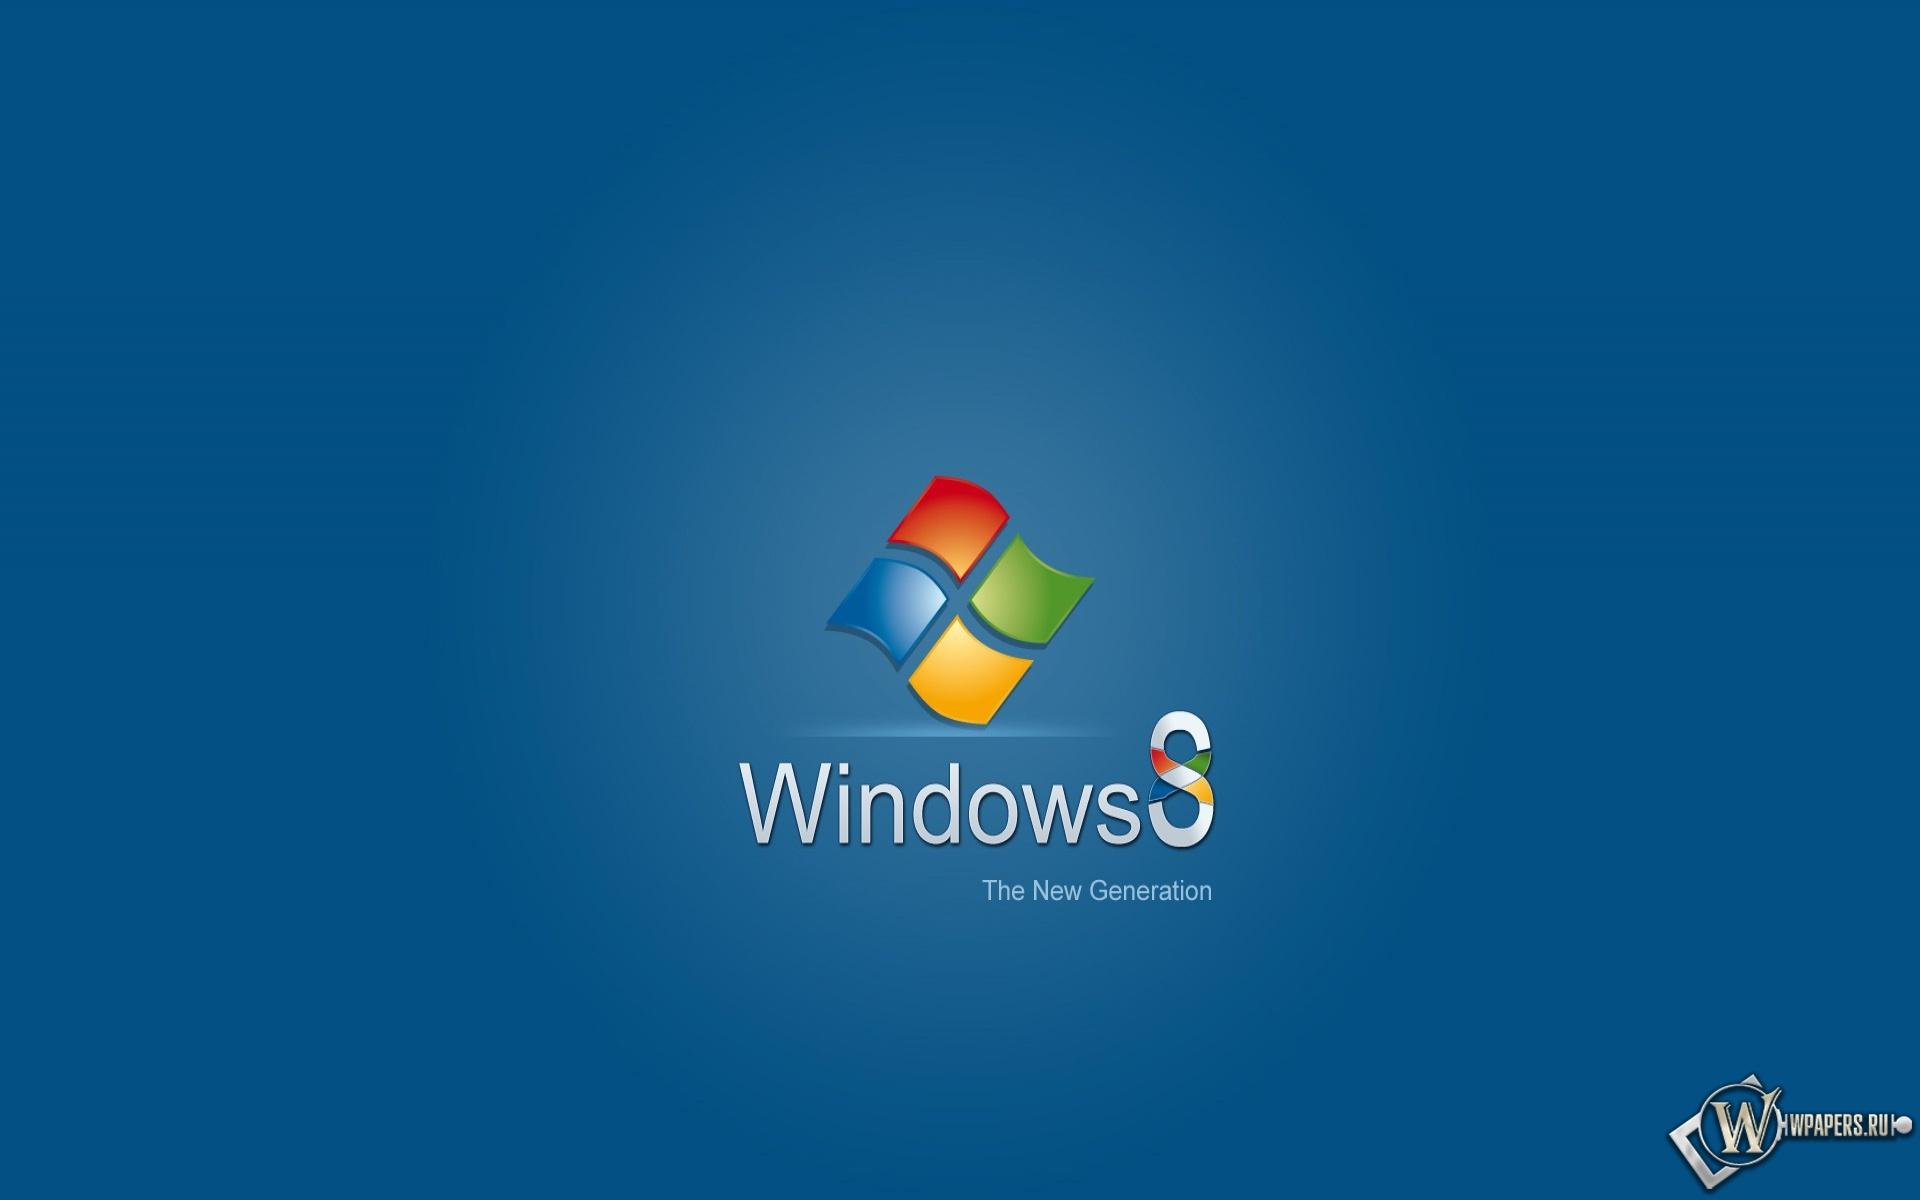 Windows 8 ne generation 1920x1200